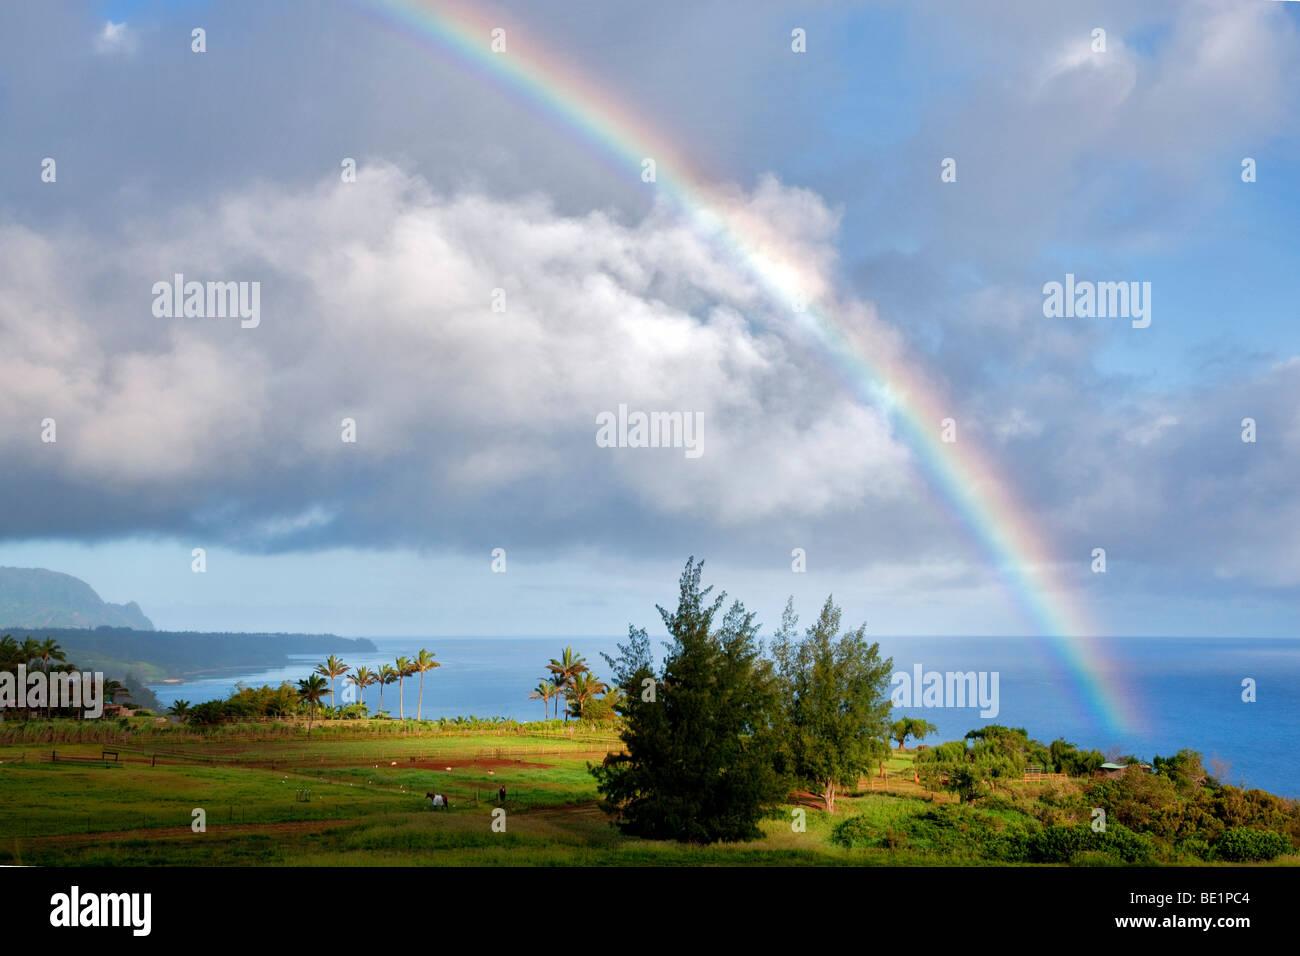 Rainbow at Kilauea Point, Kauai, Hawaii. - Stock Image